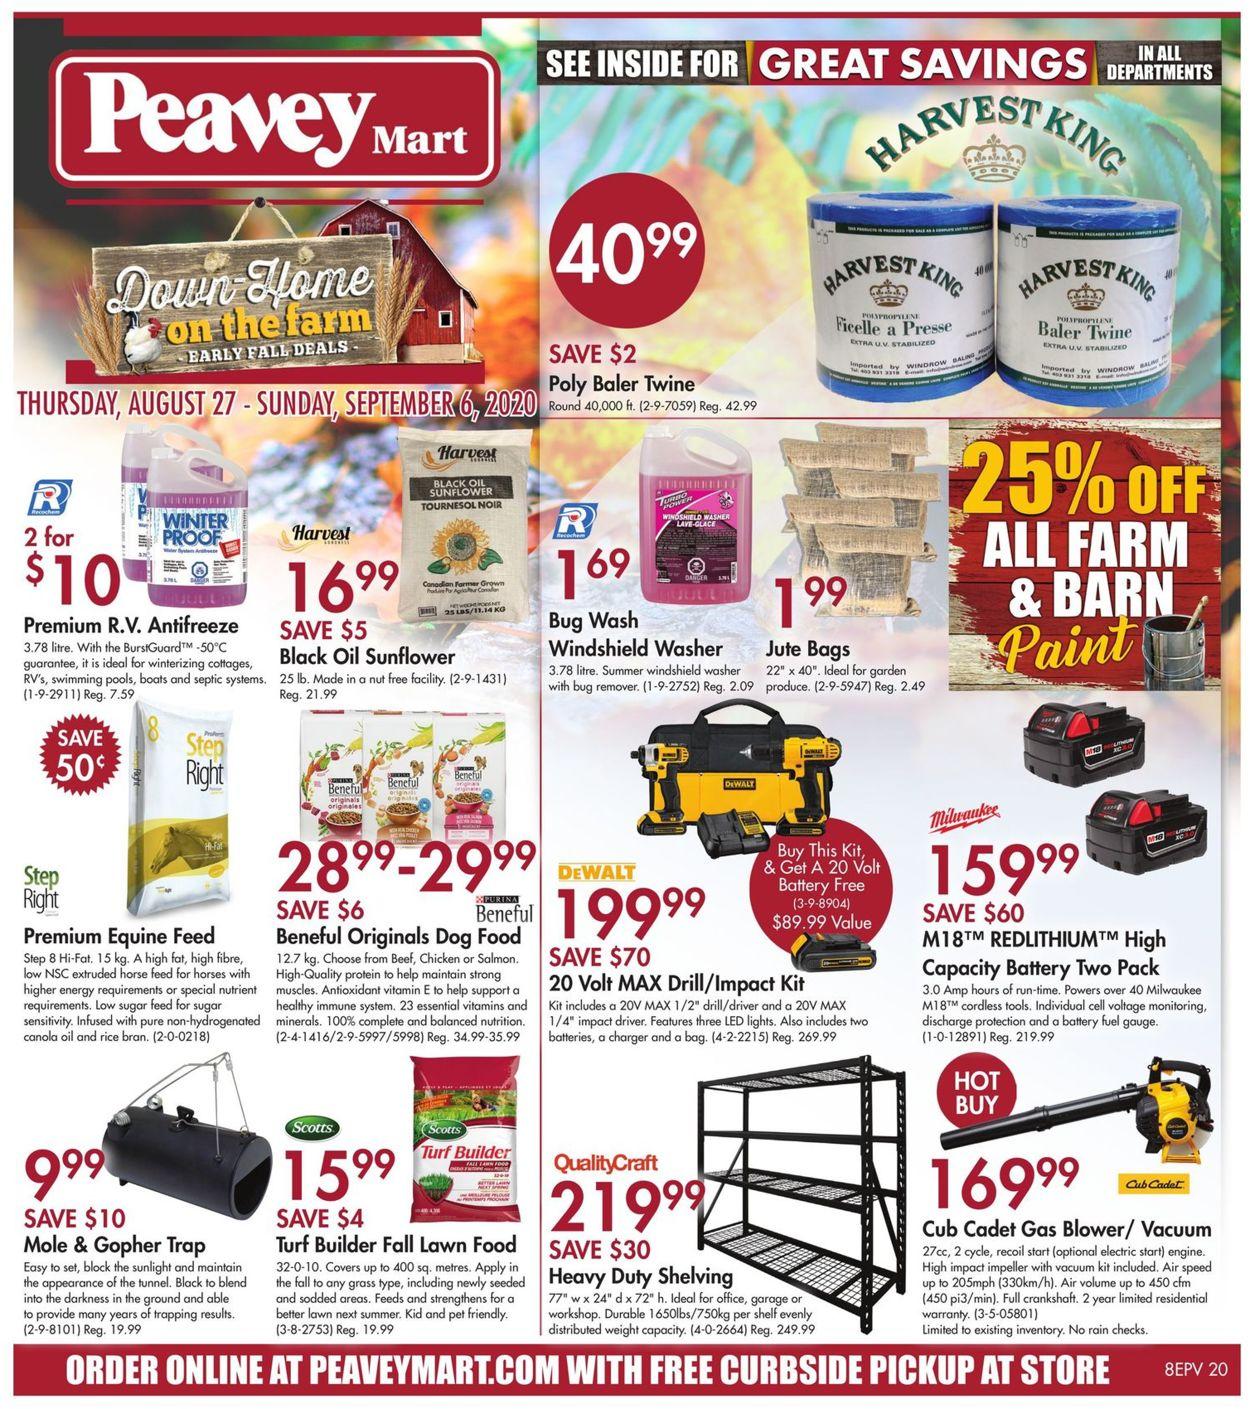 Peavey Mart Flyer - 08/27-09/06/2020